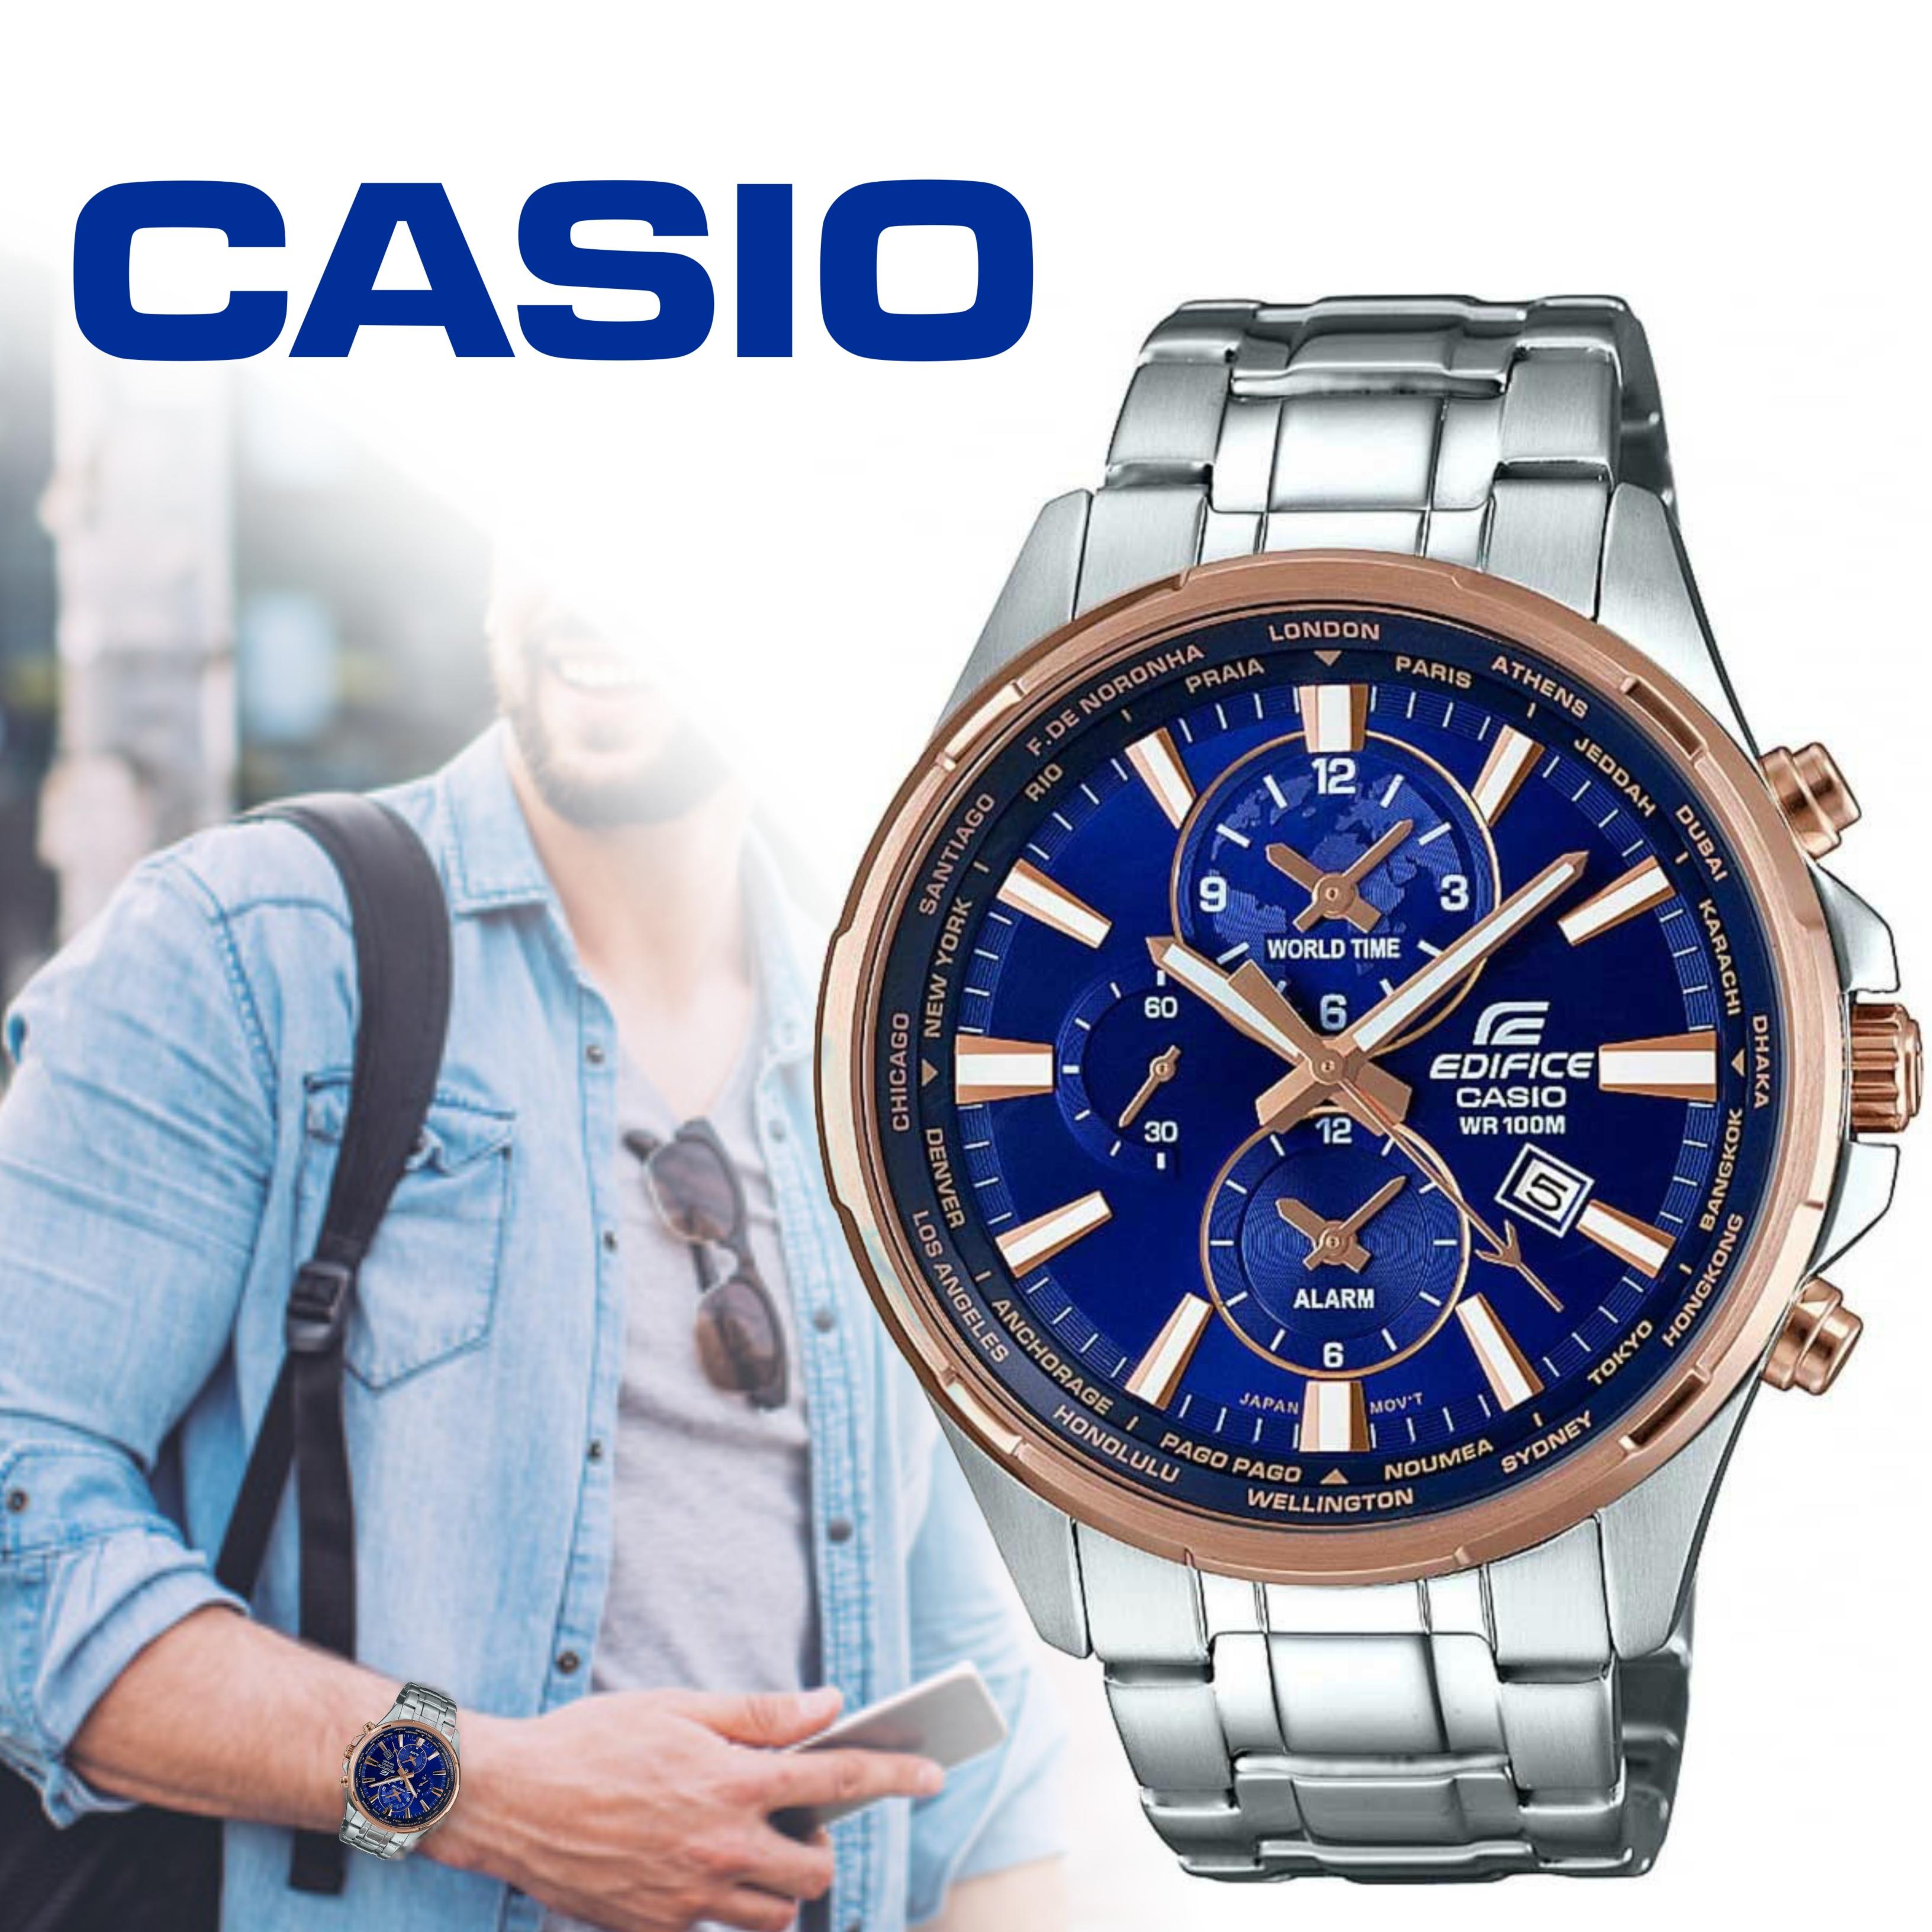 Casio Edifice Men S Worldtime Casual Watch Two Tone Blue Dial Efr